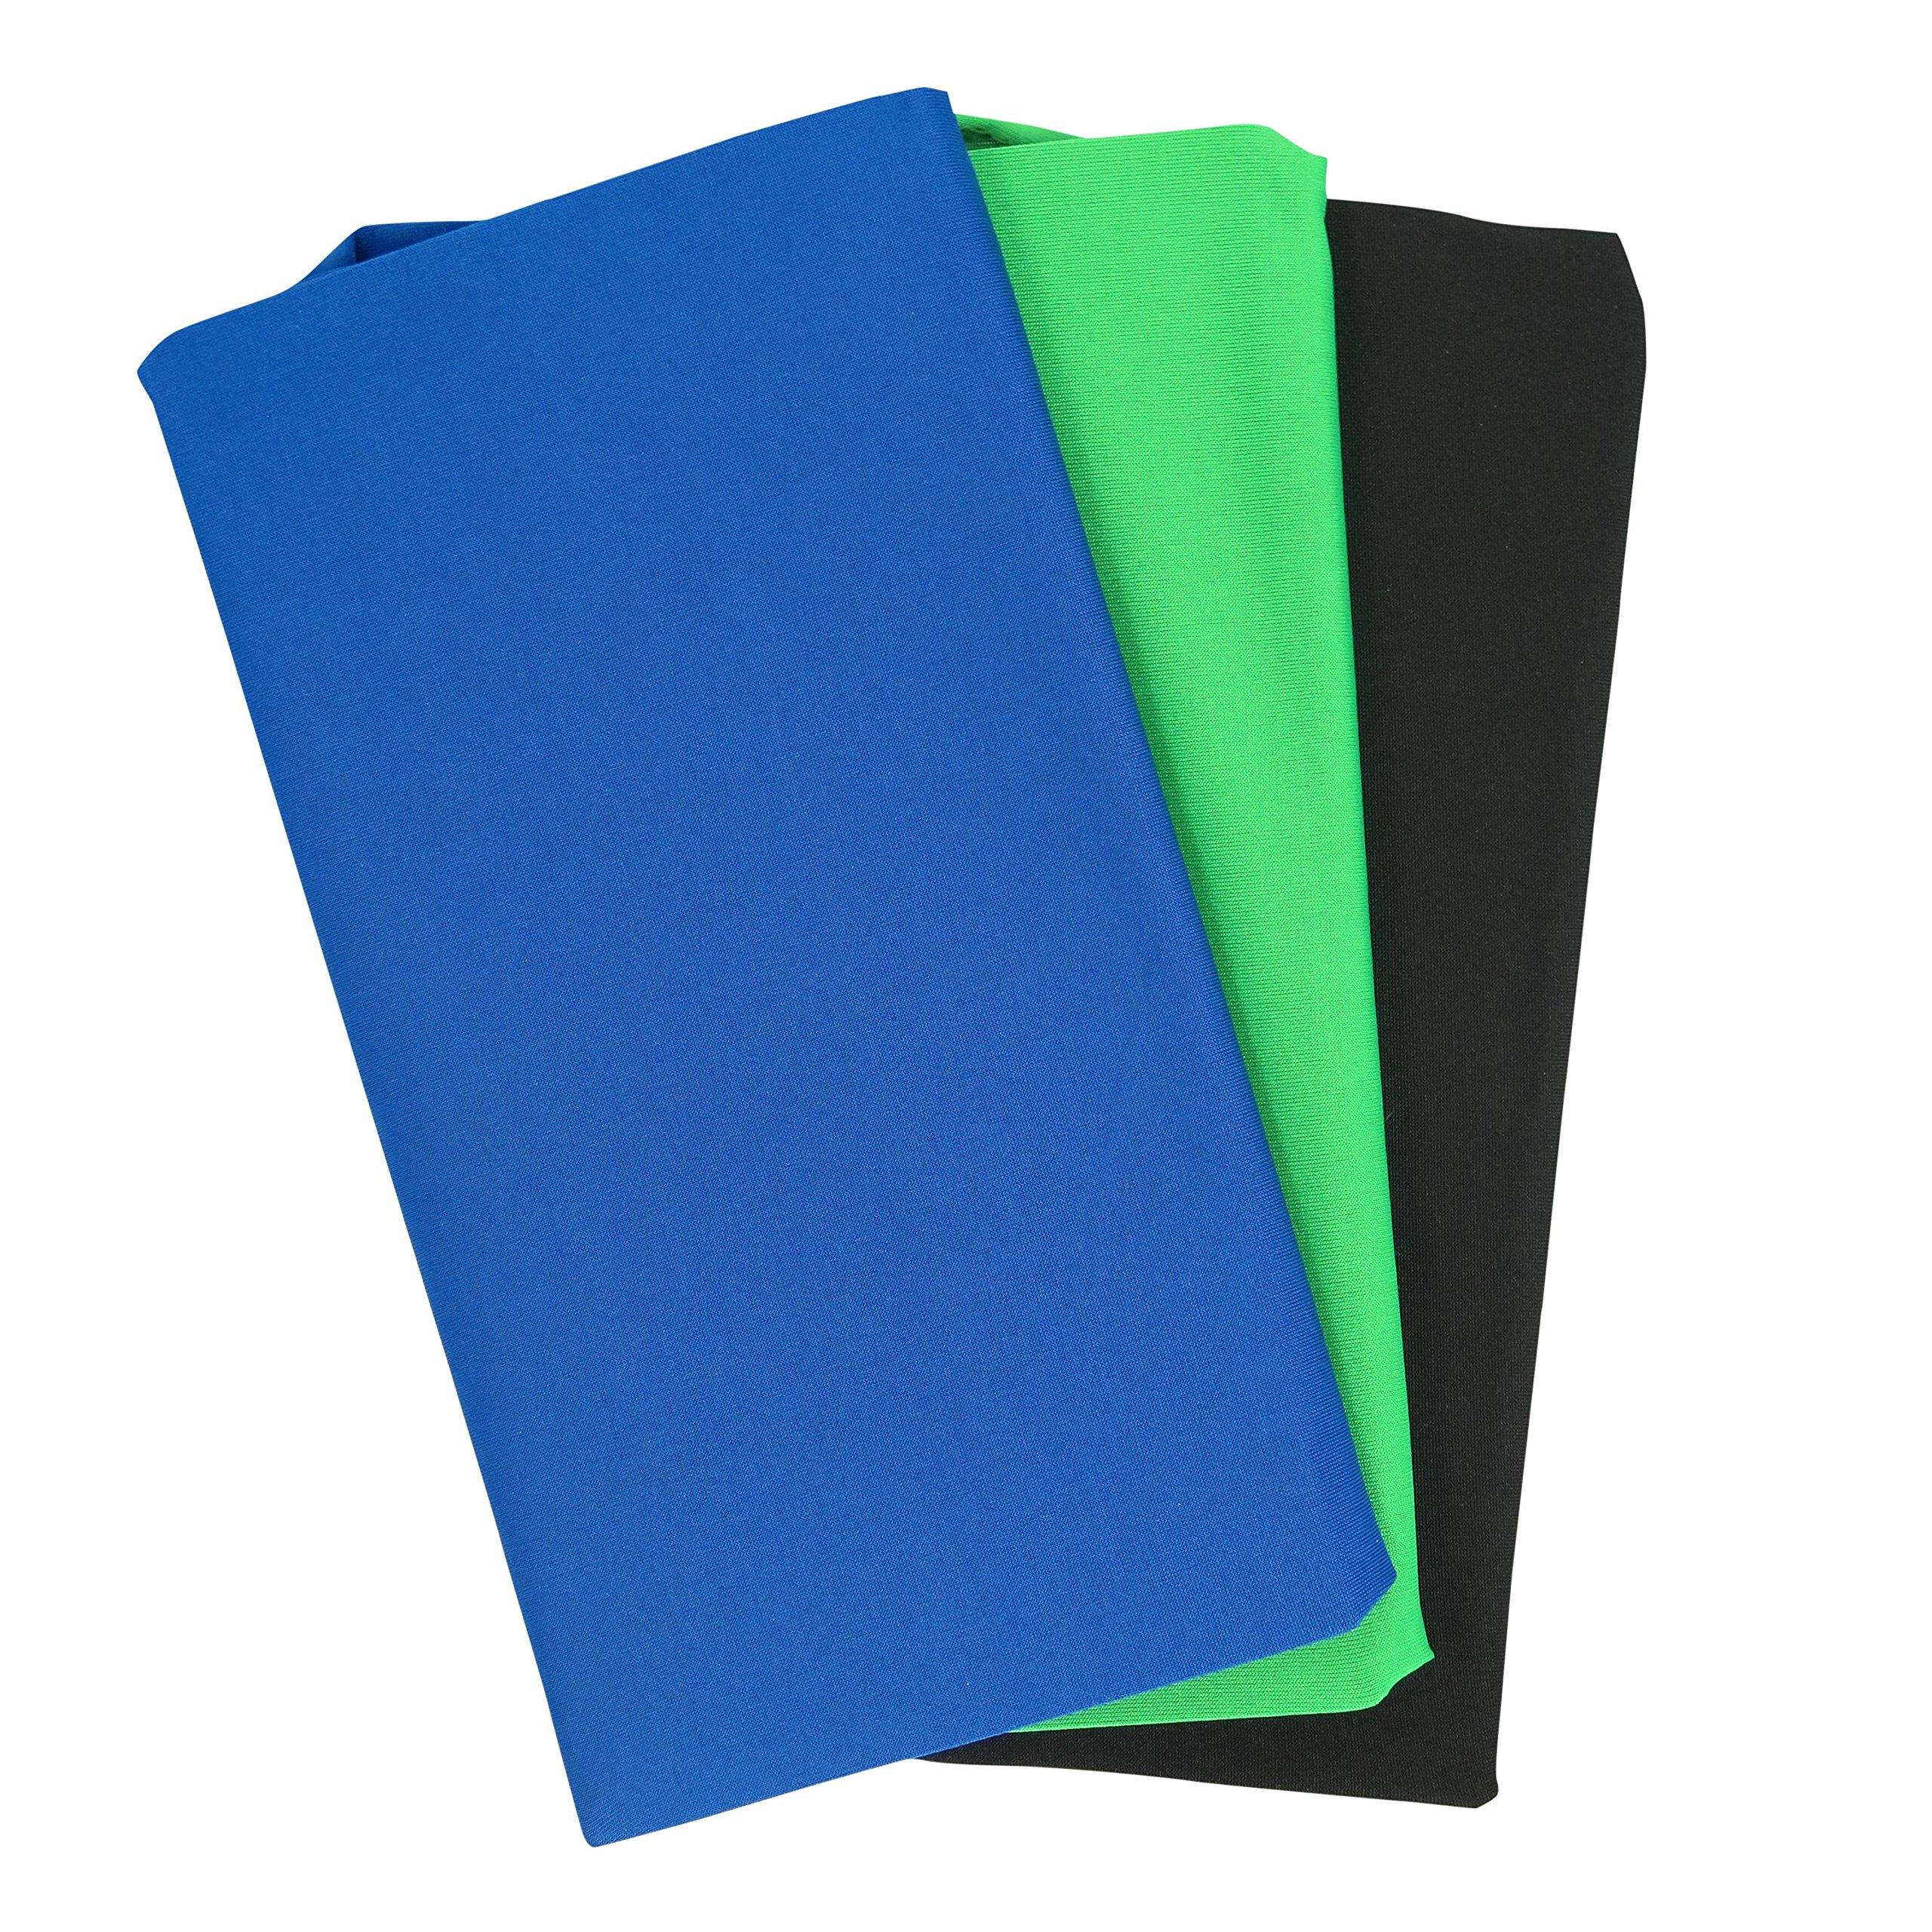 Black, Blue & Green Jumbo Fabric Book Covers 3 Pack